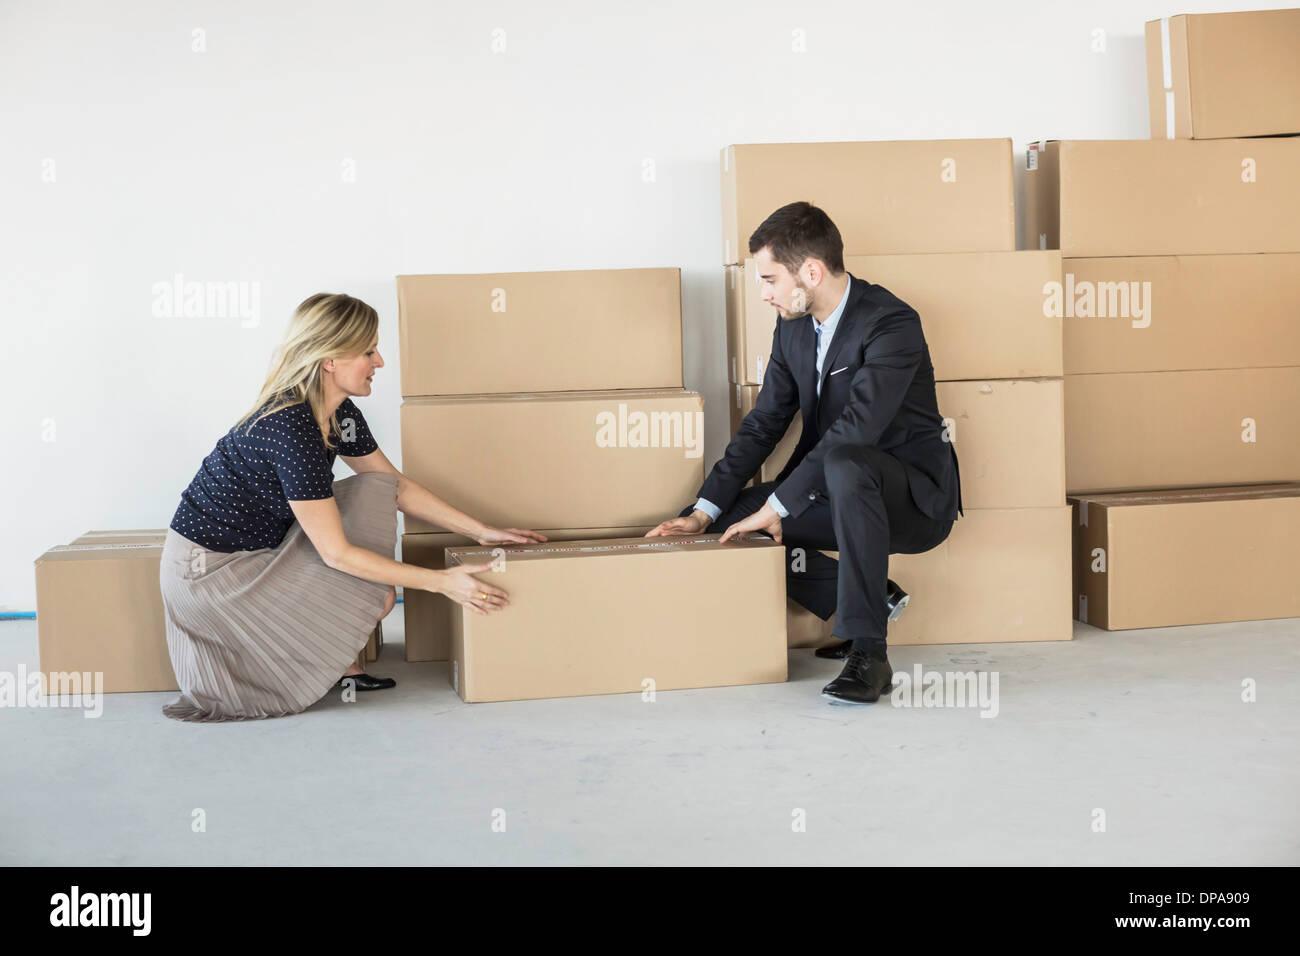 Businessman and -woman lifting cardboard box - Stock Image